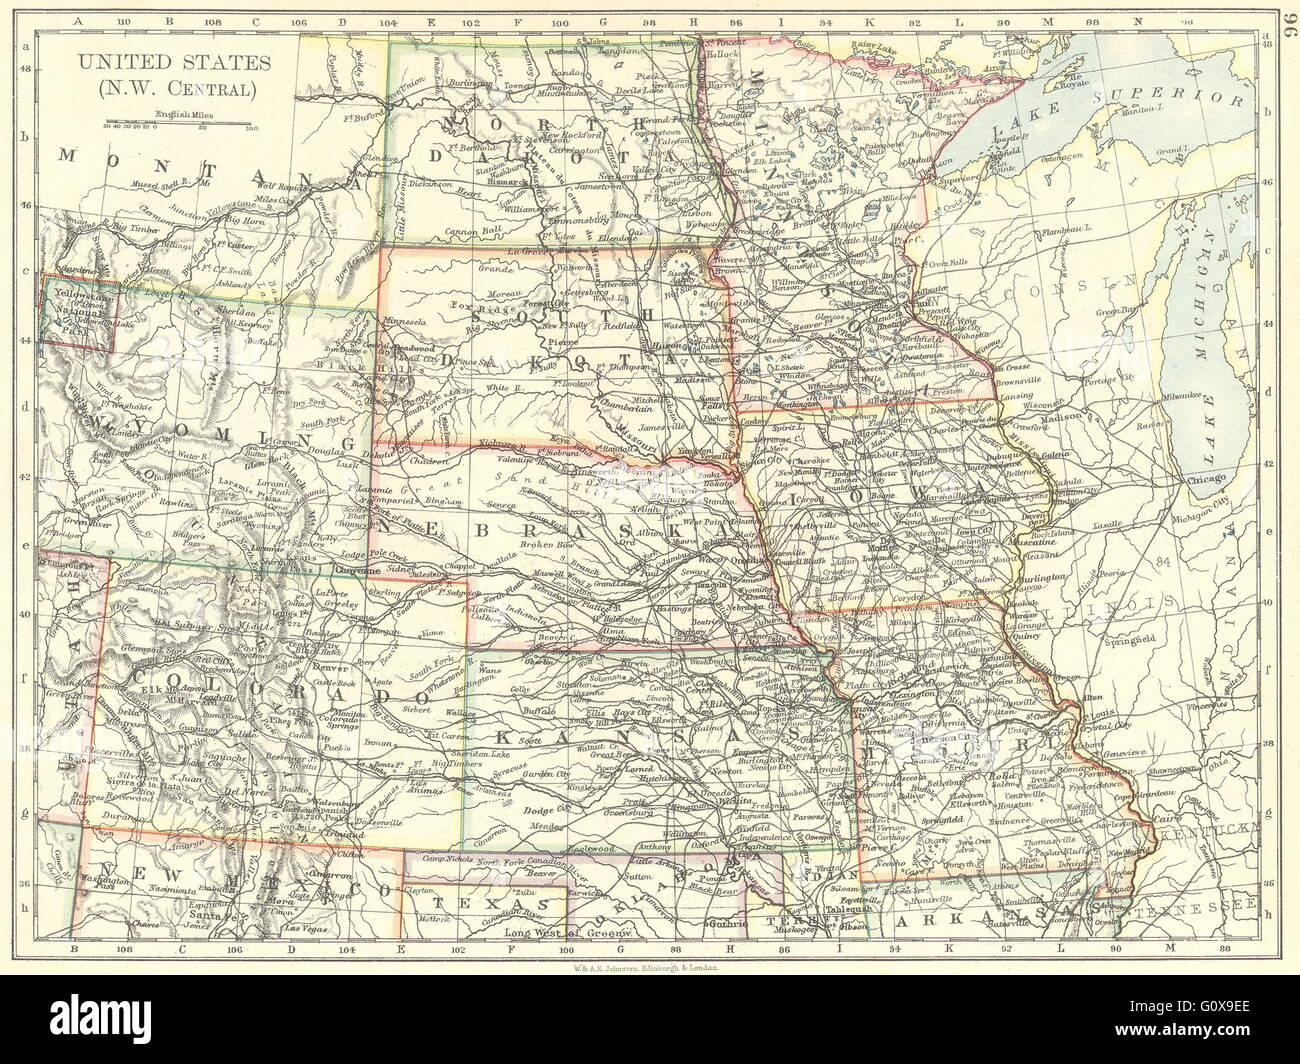 Nw Colorado Map.Usa Nw Central Dakota Wyoming Colorado Kansas Iowa Missouri Stock